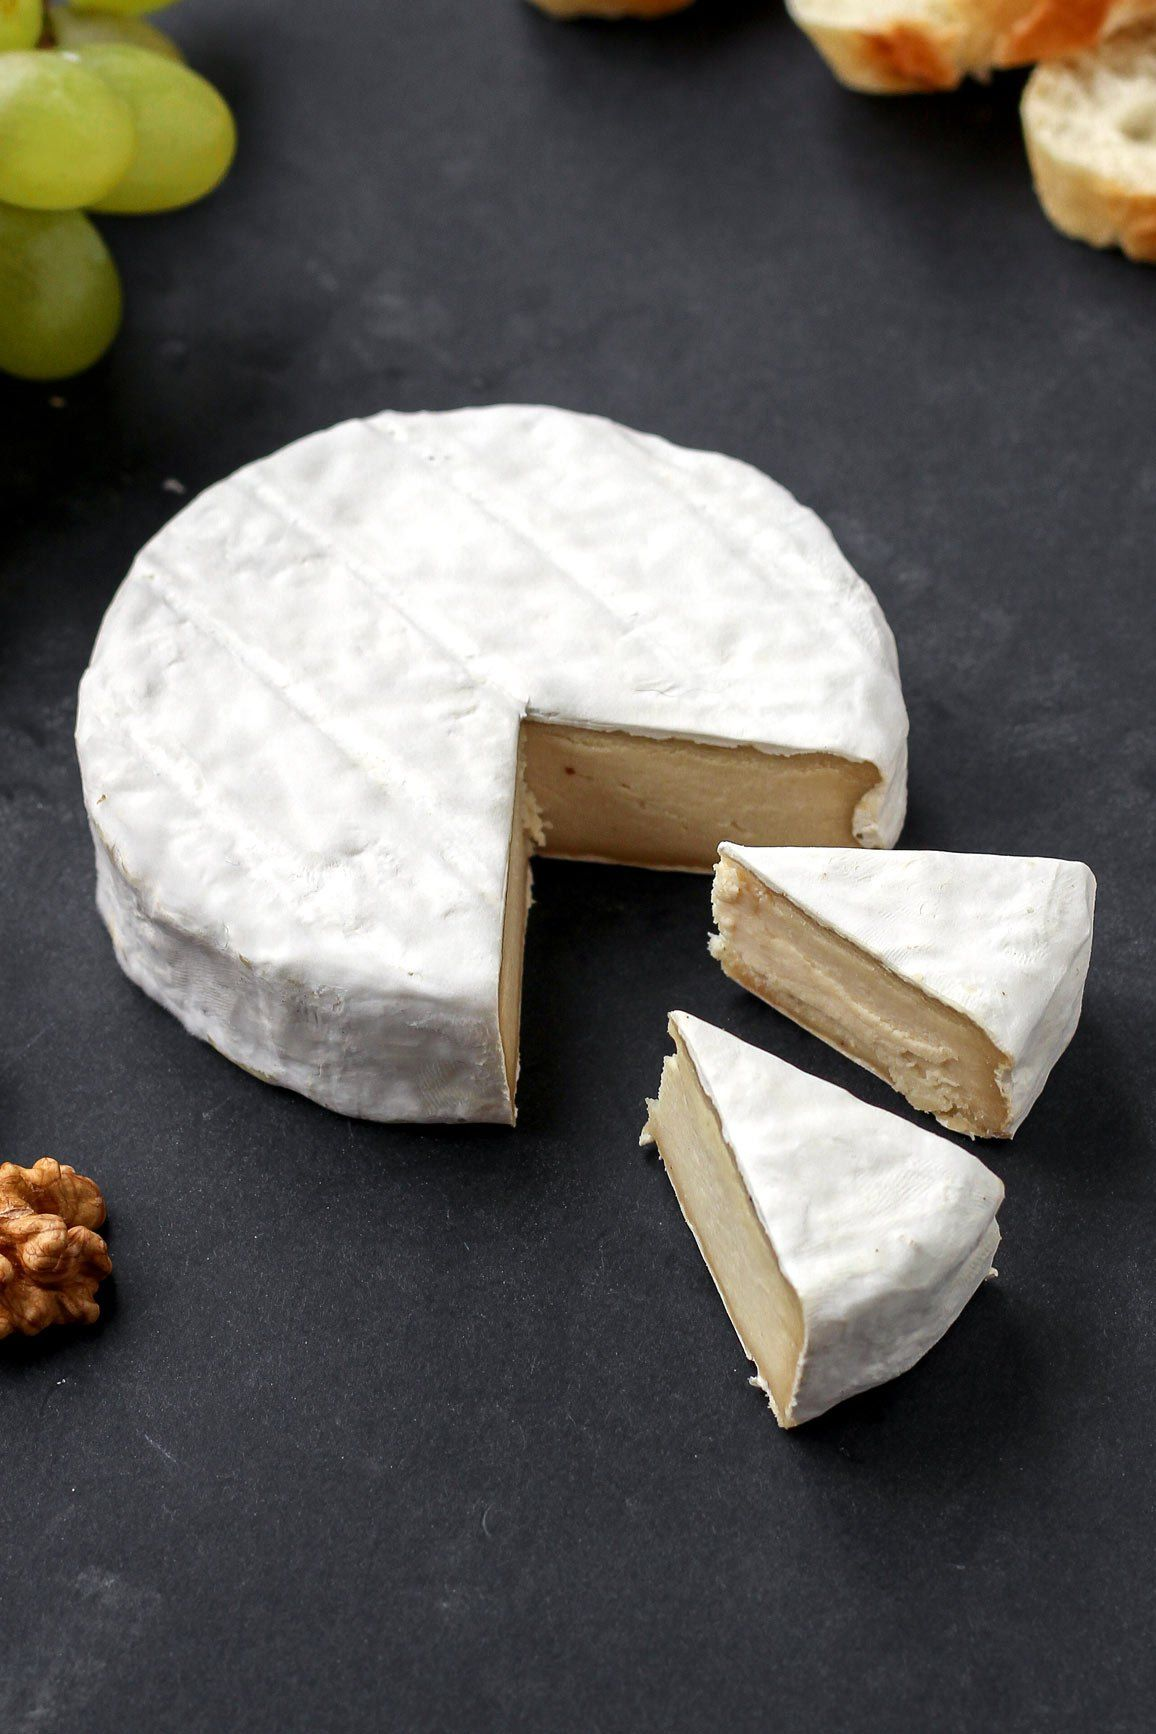 Vegan Aged Camembert Cheese Full Of Plants Recipe Vegan Cheese Recipes Best Vegan Cheese Vegan Recipes